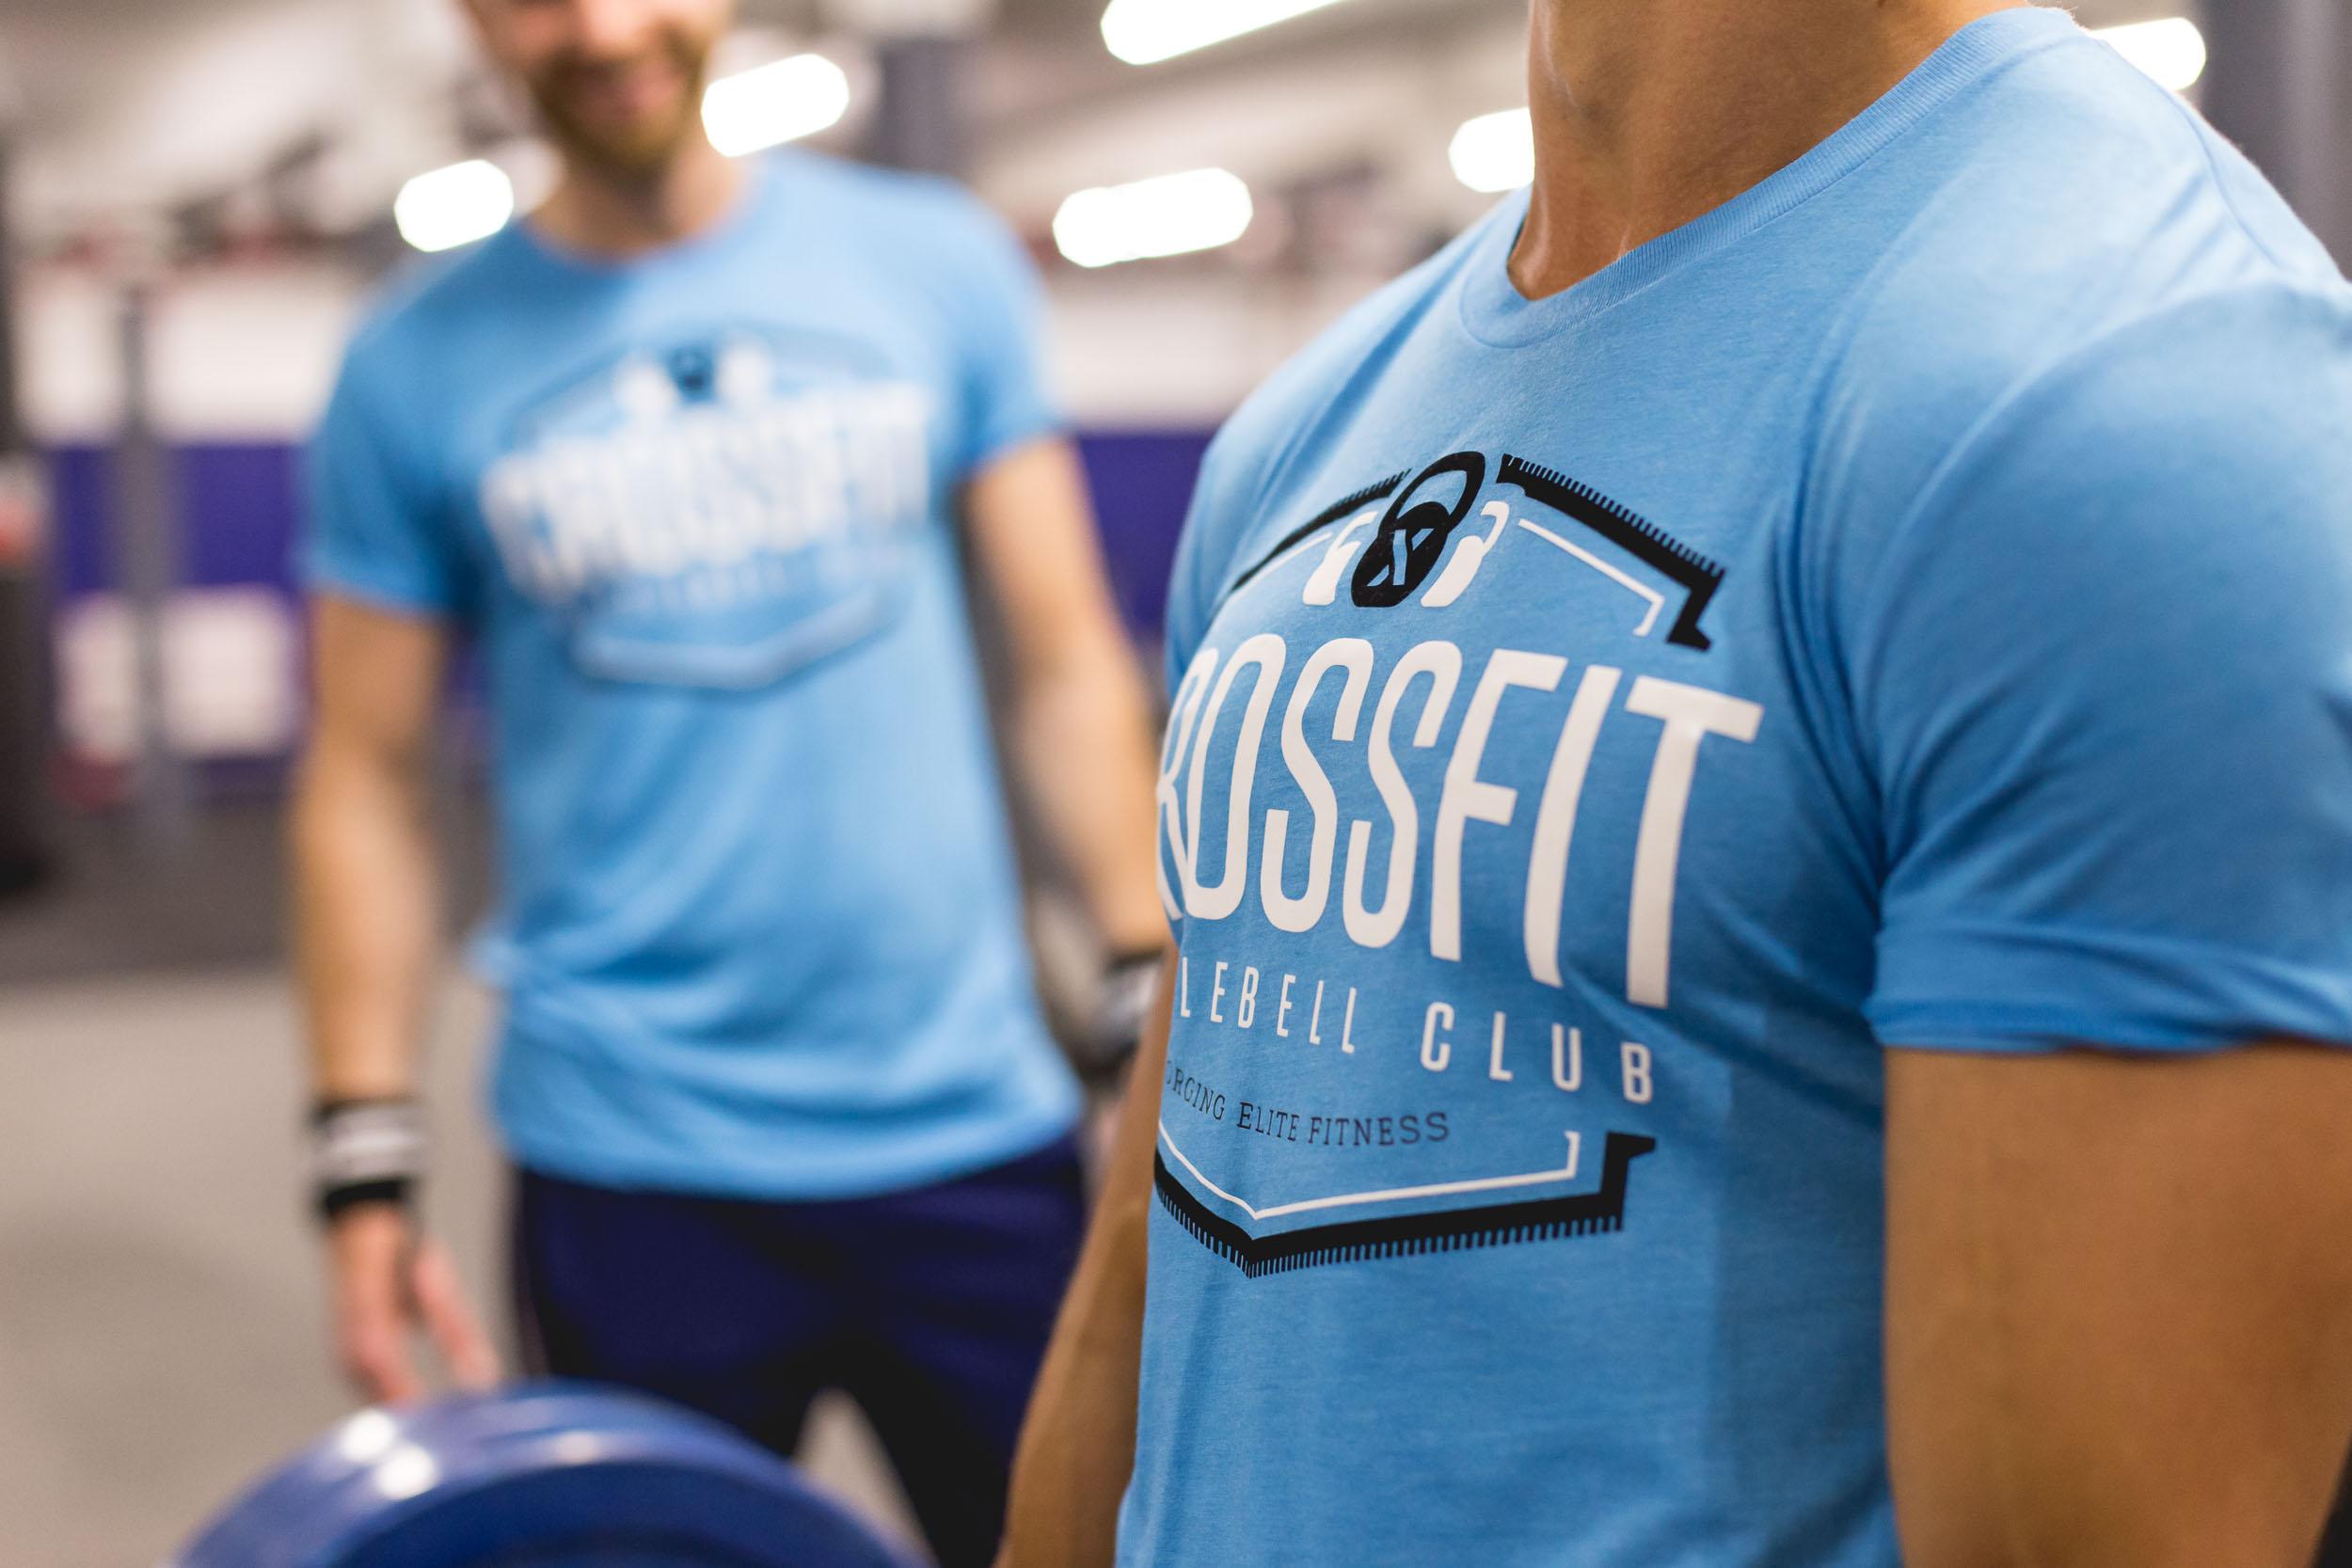 Crossfit UK printed clothing t-shirts-9287.jpg